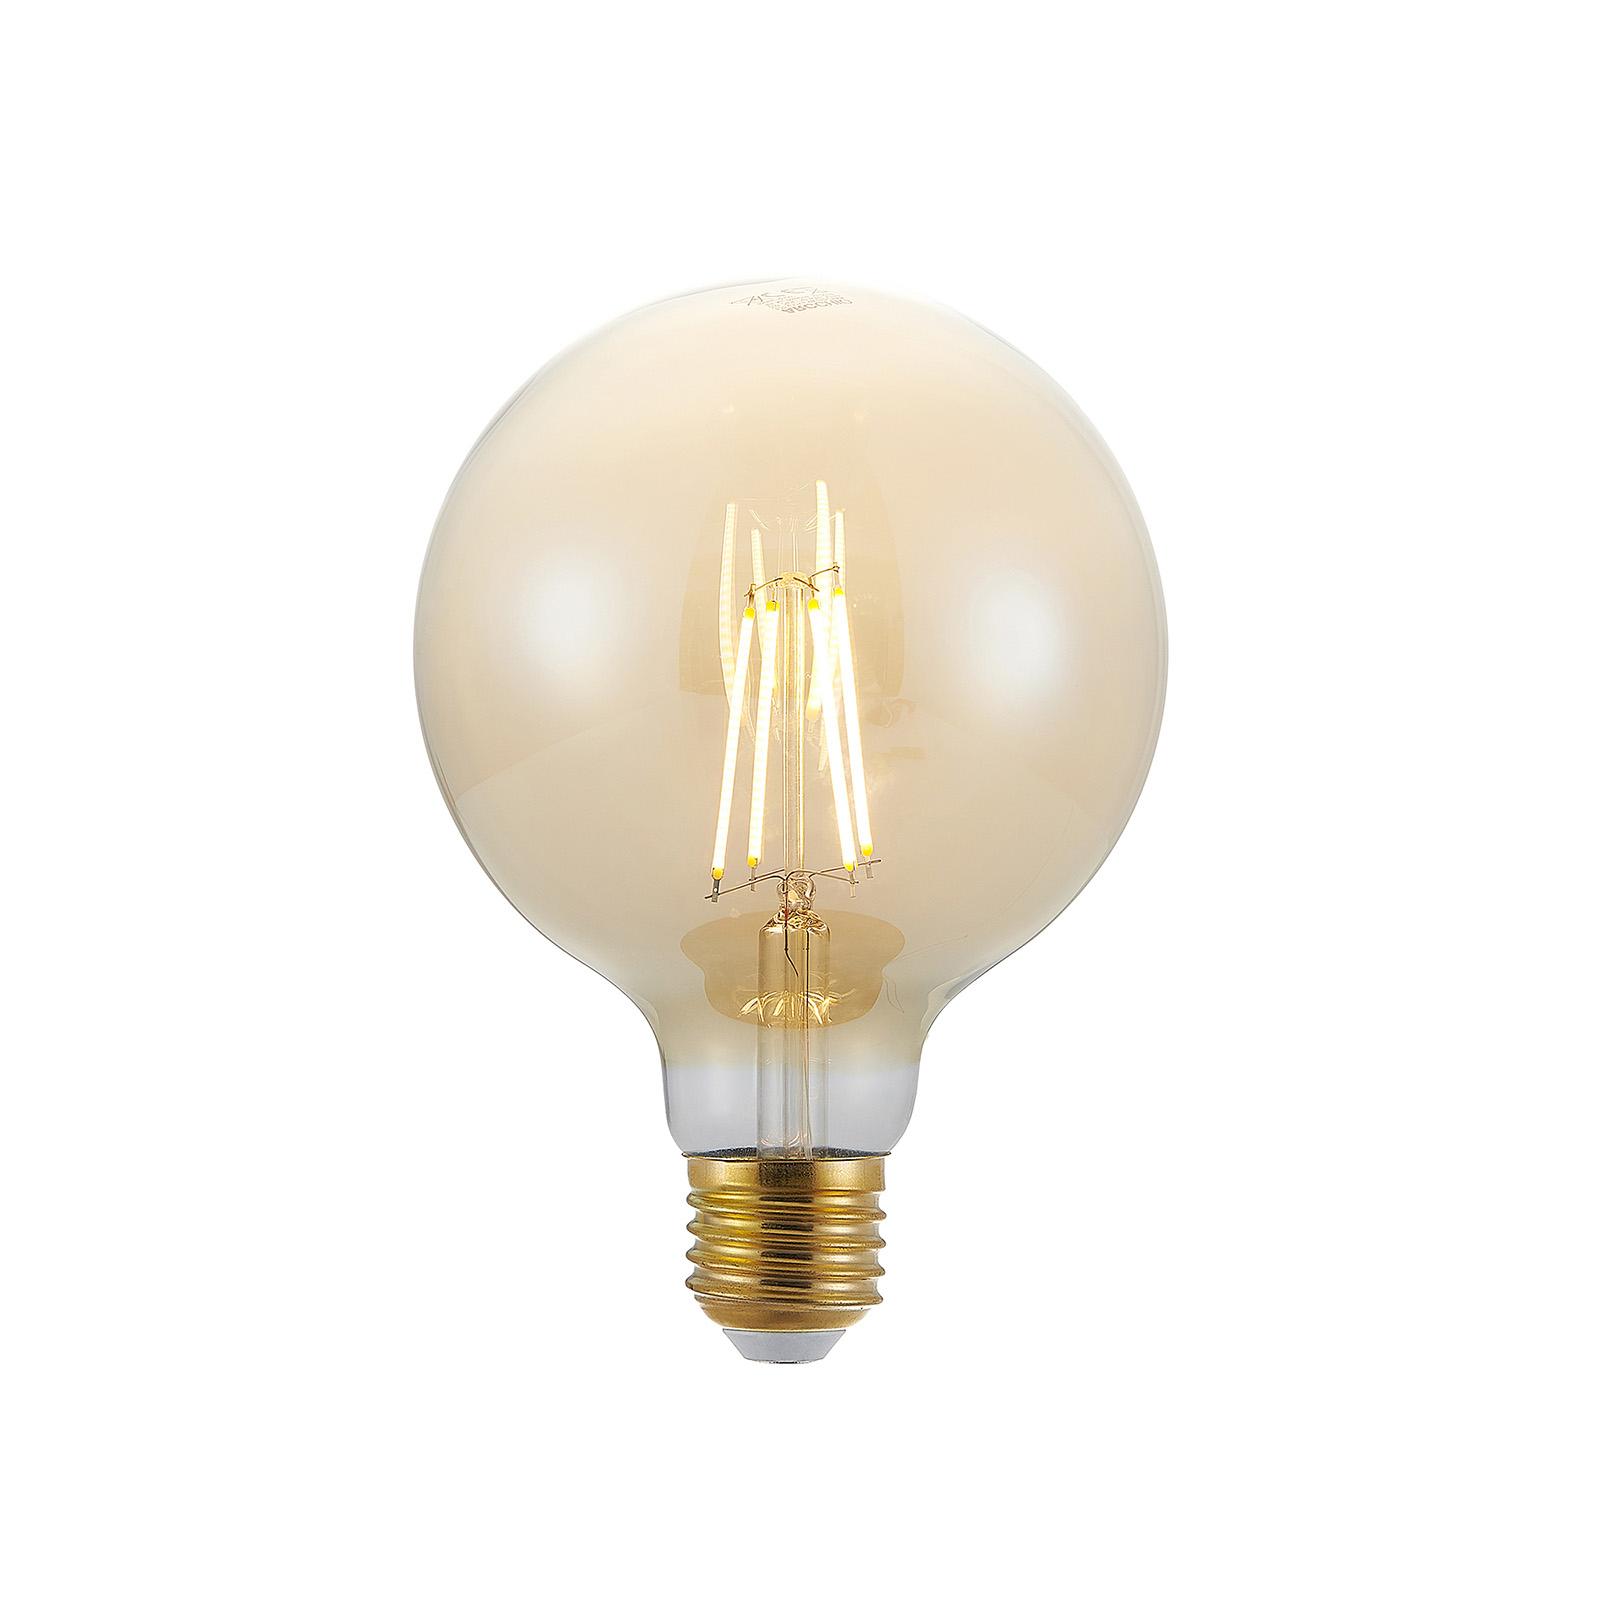 led lampen leuchten kurz auf